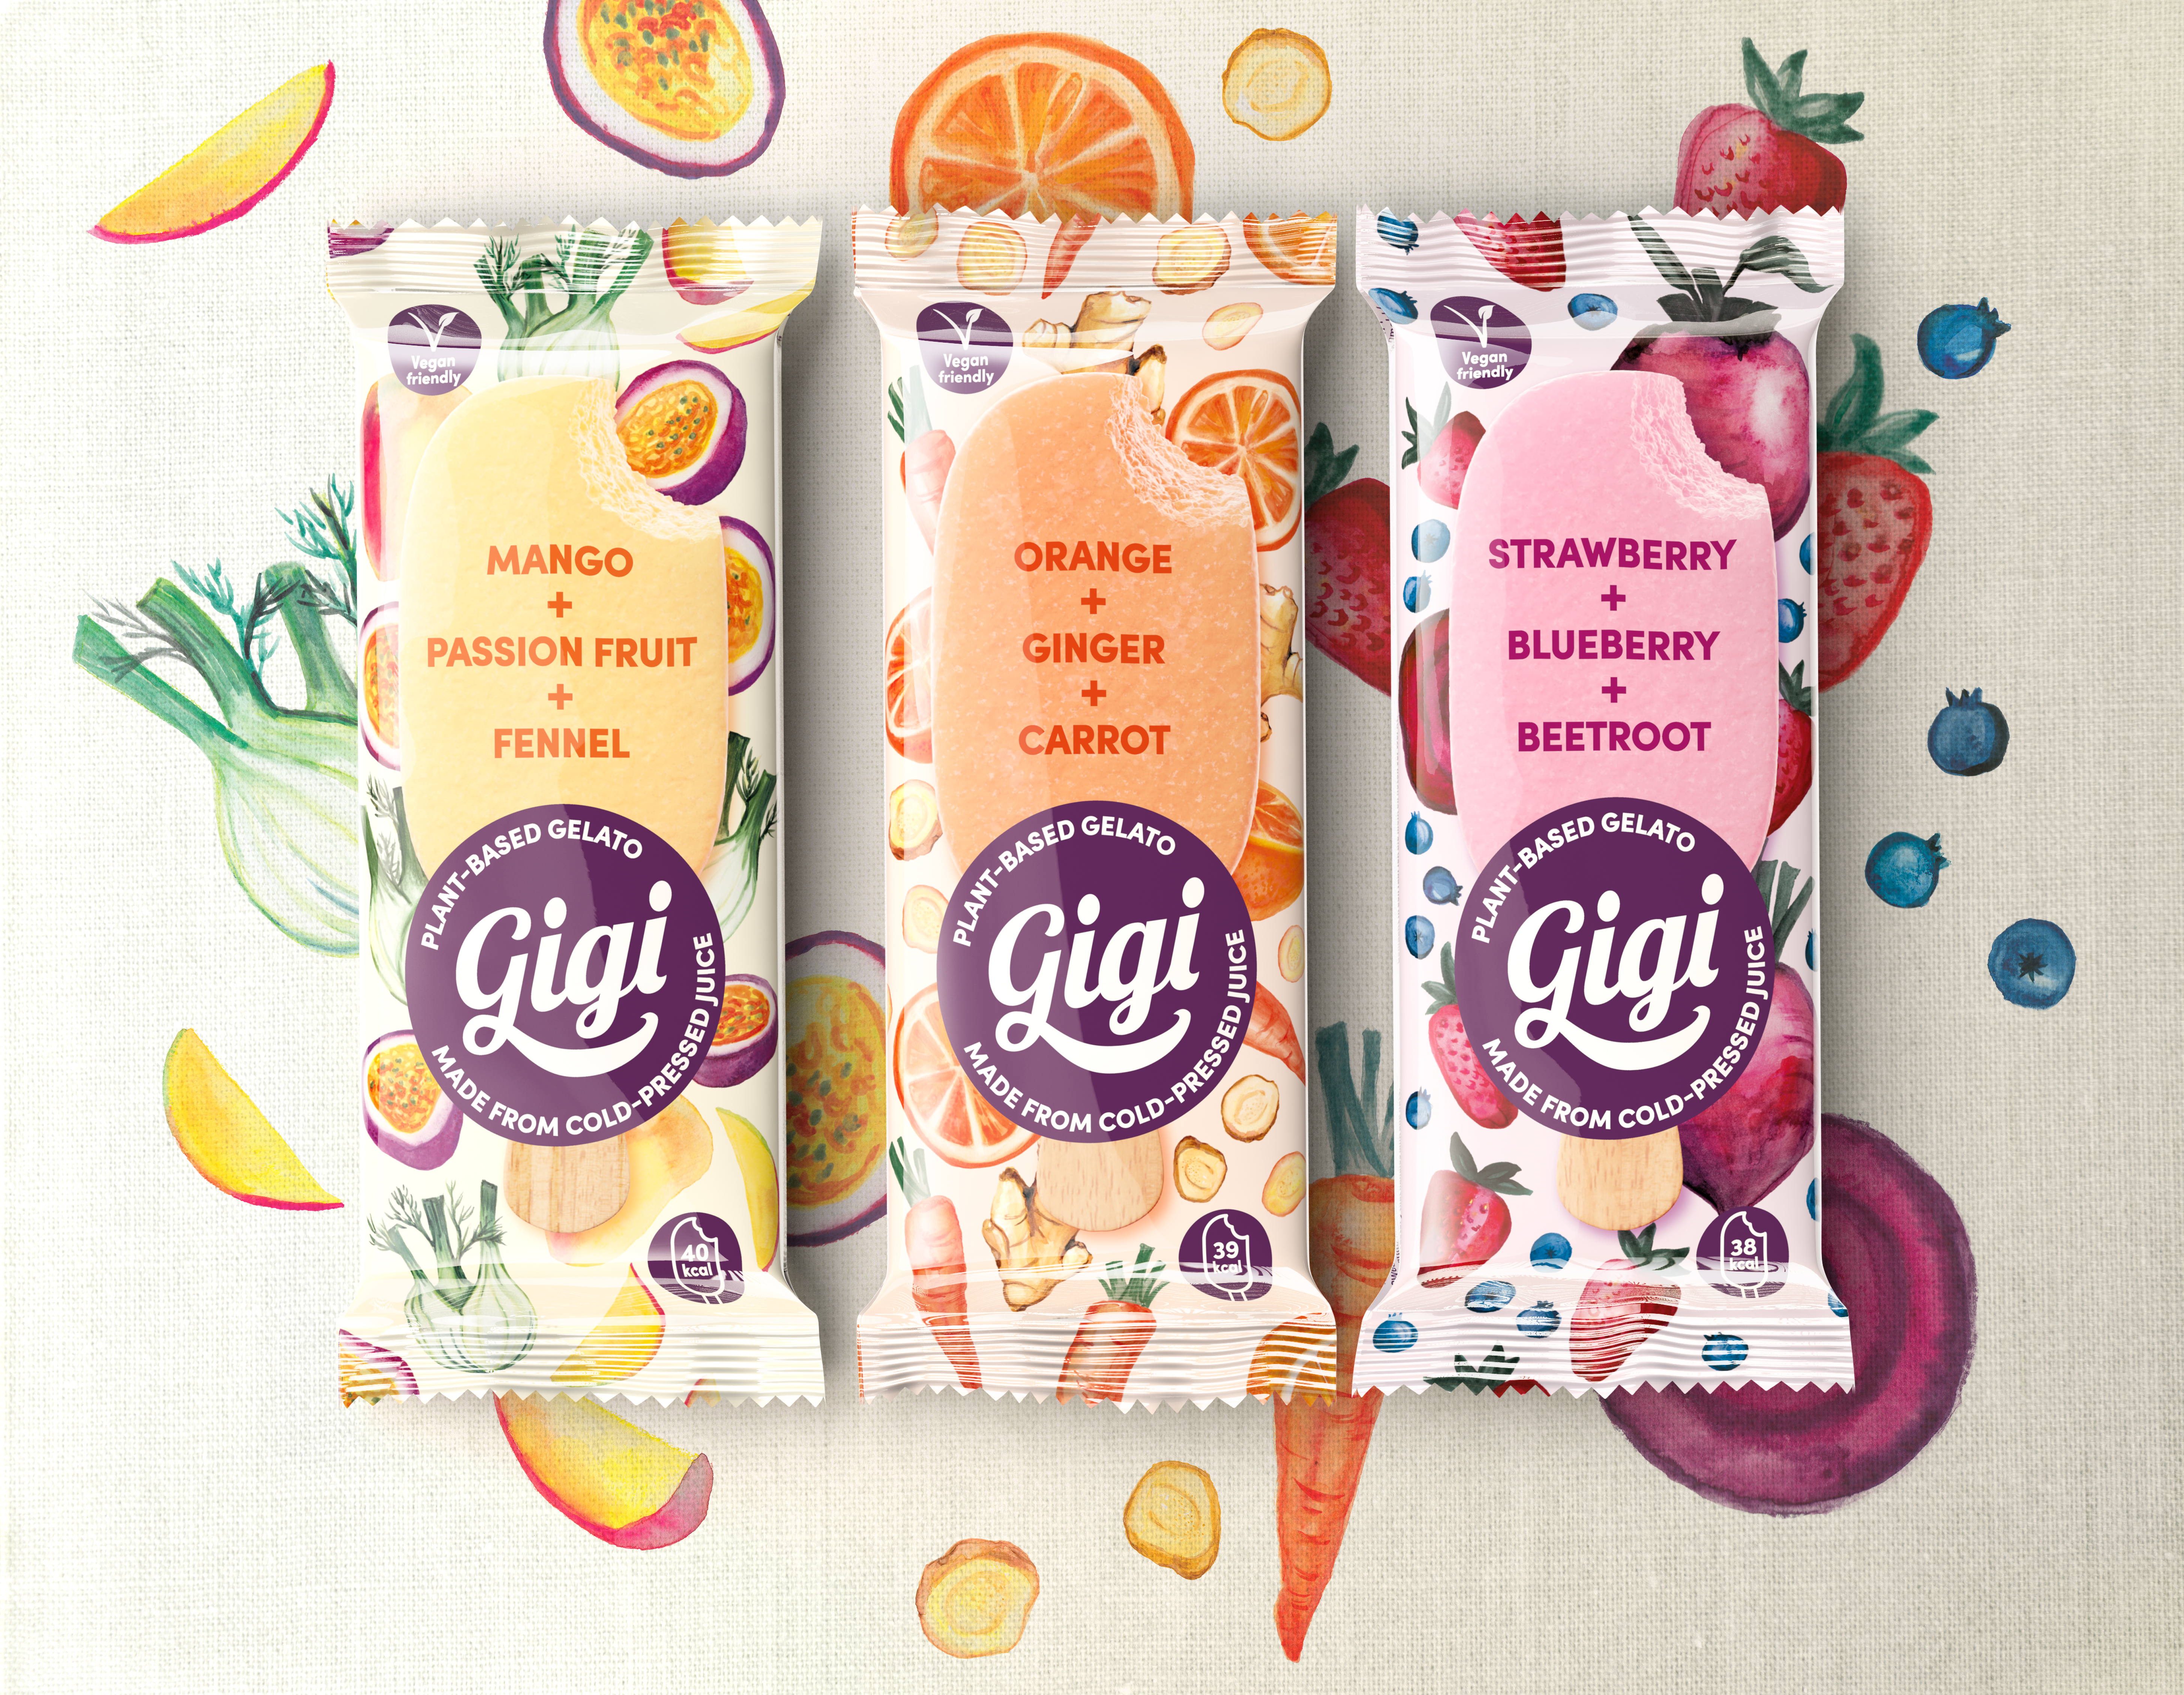 plant-based gelato